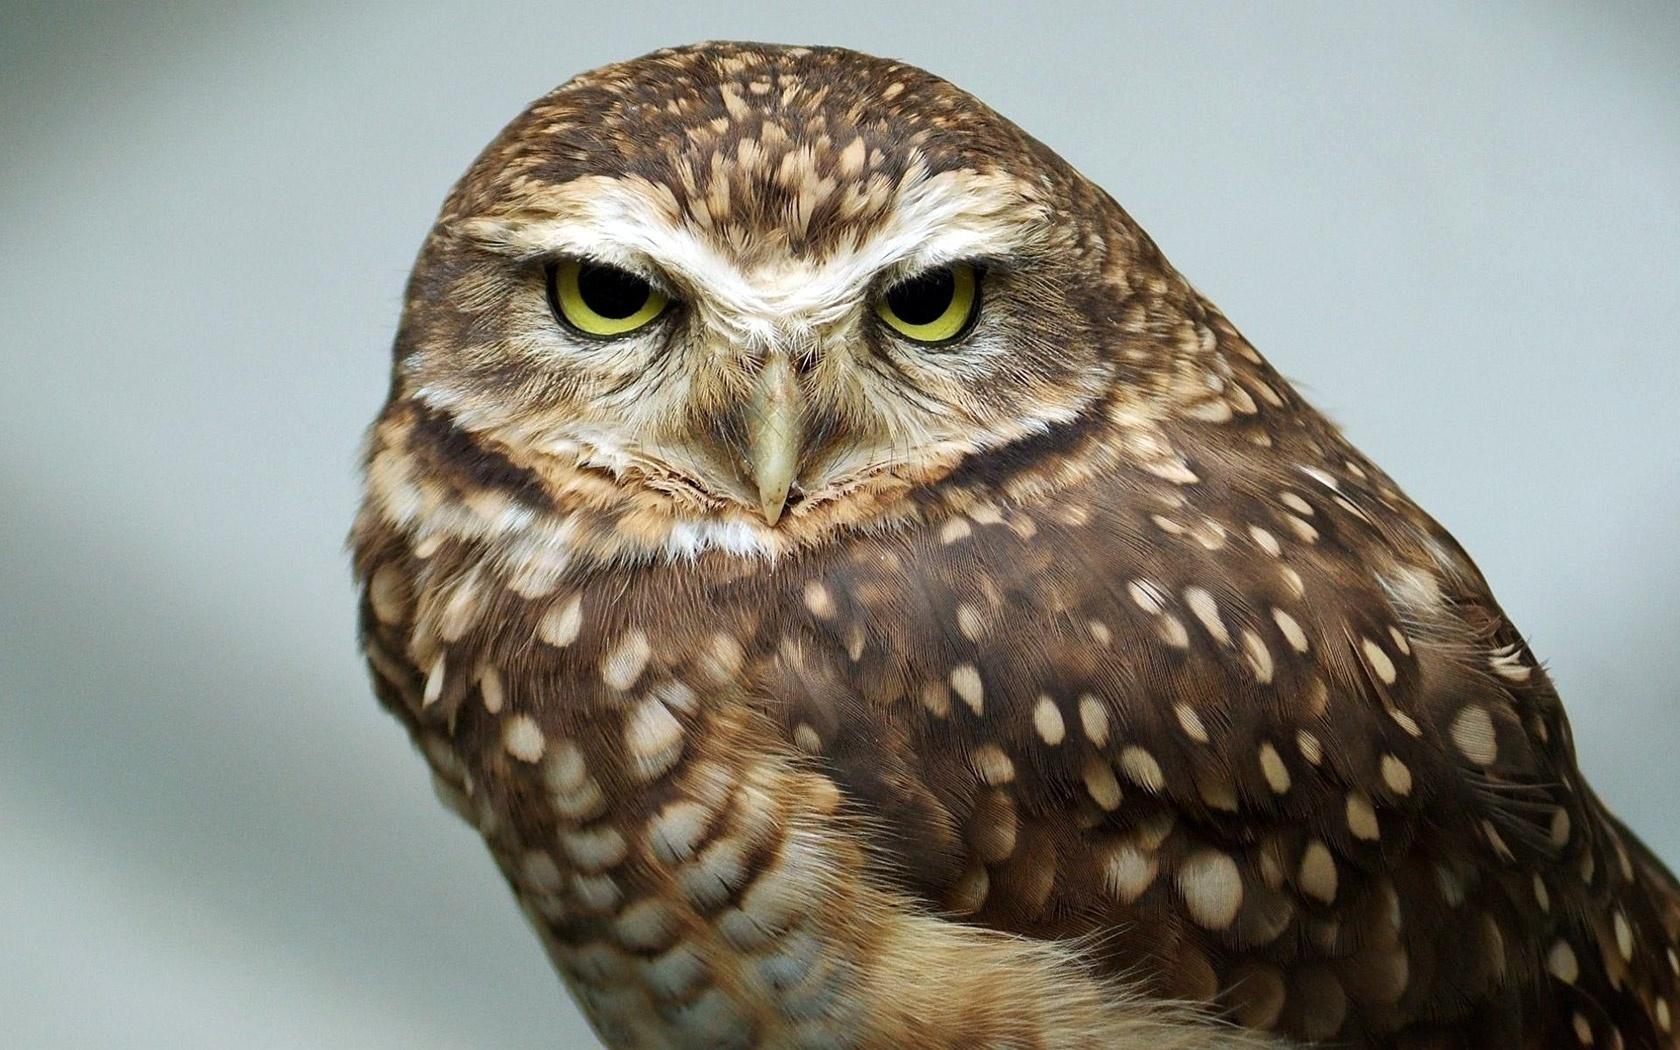 желтые глаза, сова, принебрежение, owl,bird,predator